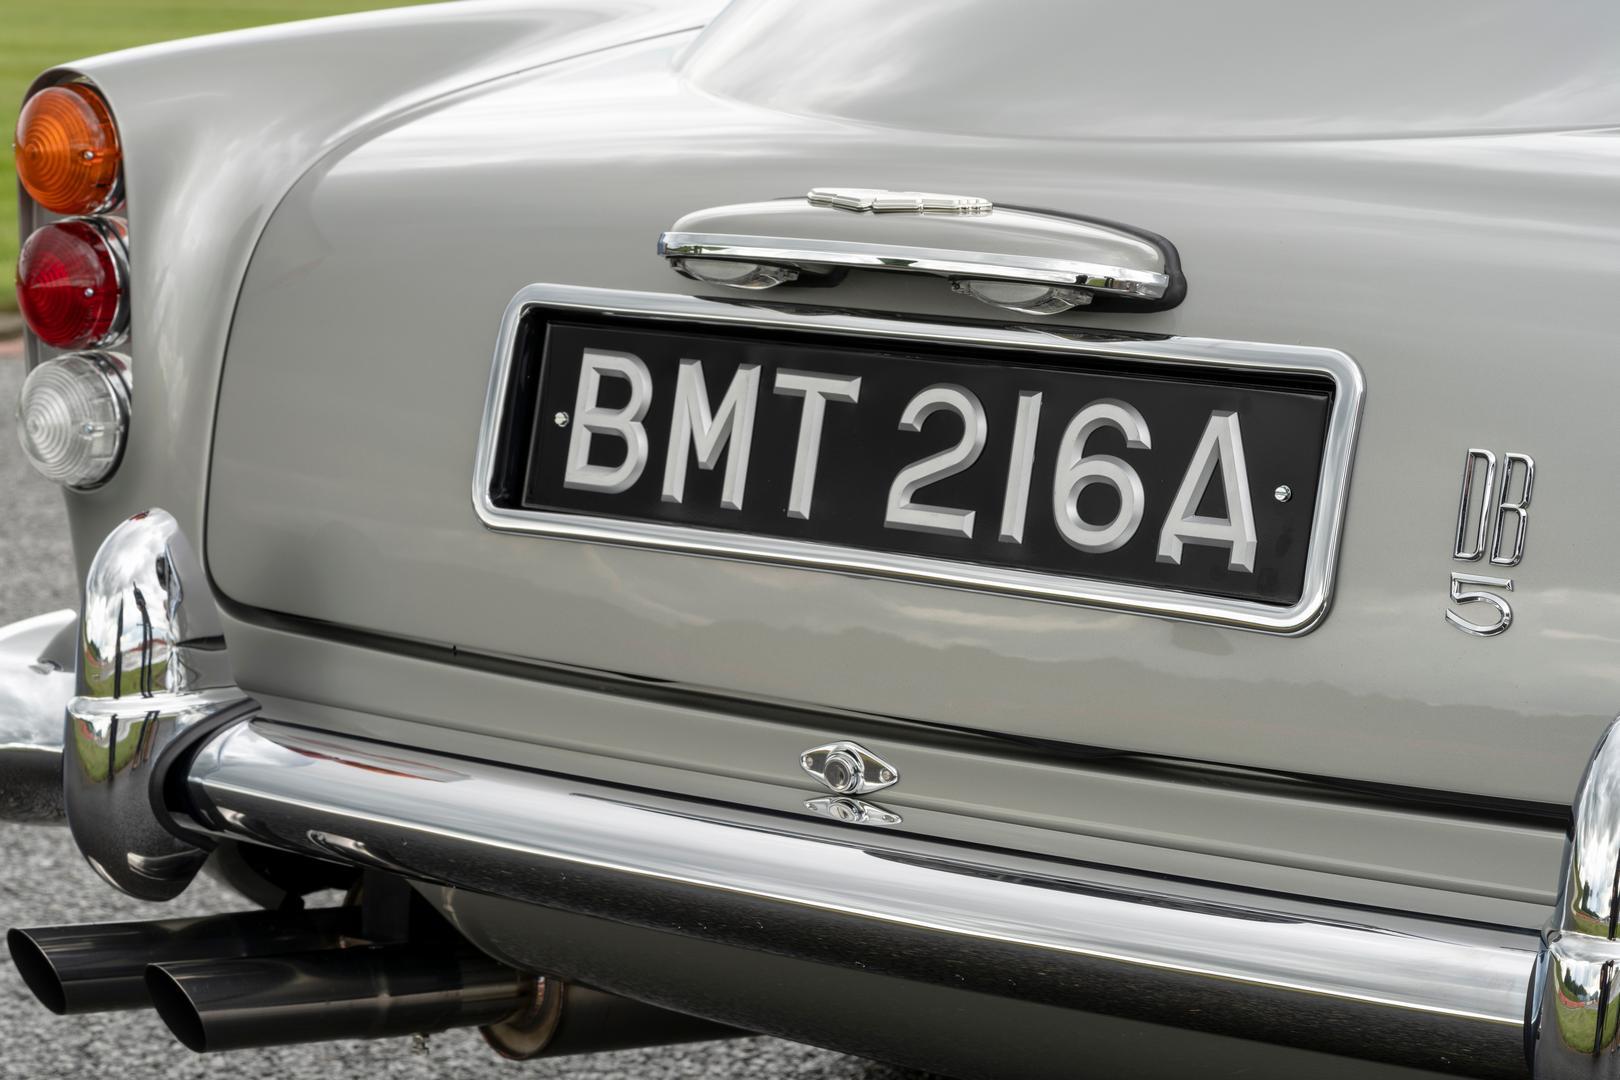 Aston Martin DB5 Number Plate